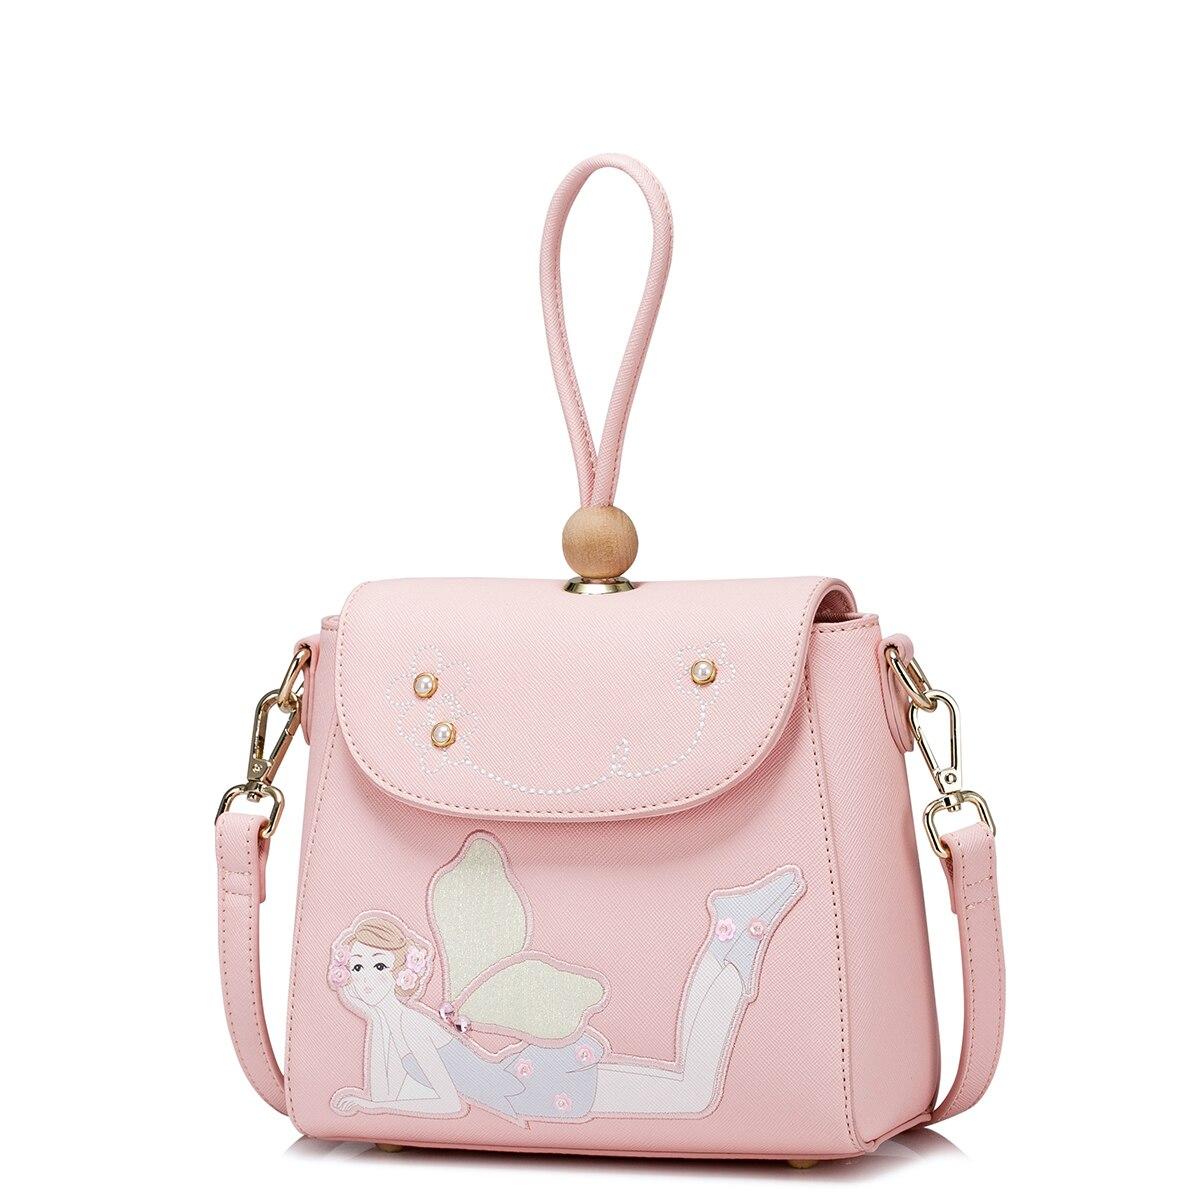 Summer Zipper Sweet Flower Fairy Korean Women handbags casual shoulder Crossbody bags Messenger tassel bag annie chun s go chu jang korean sweet